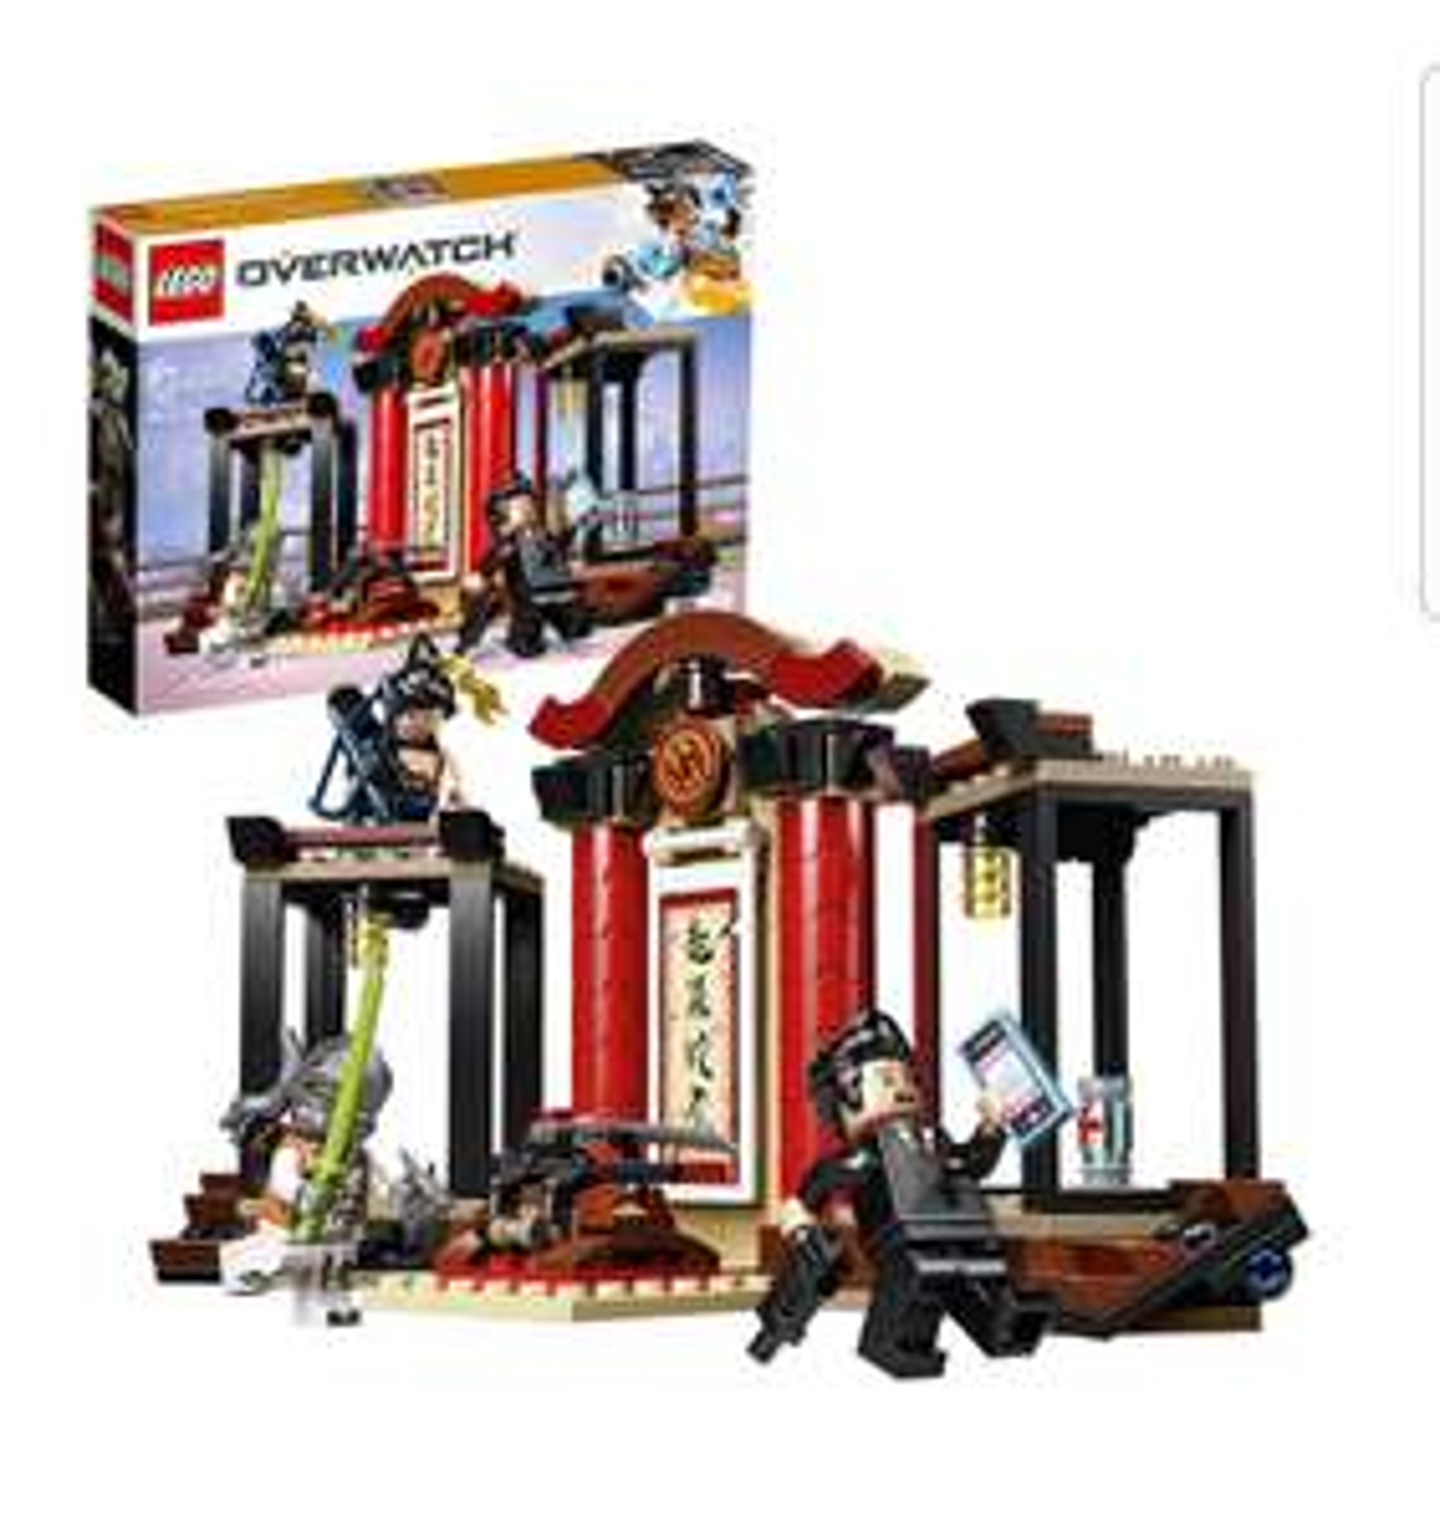 LEGO Overwatch Hanzo vs. Genji Toy 75971 £15 @ Argos